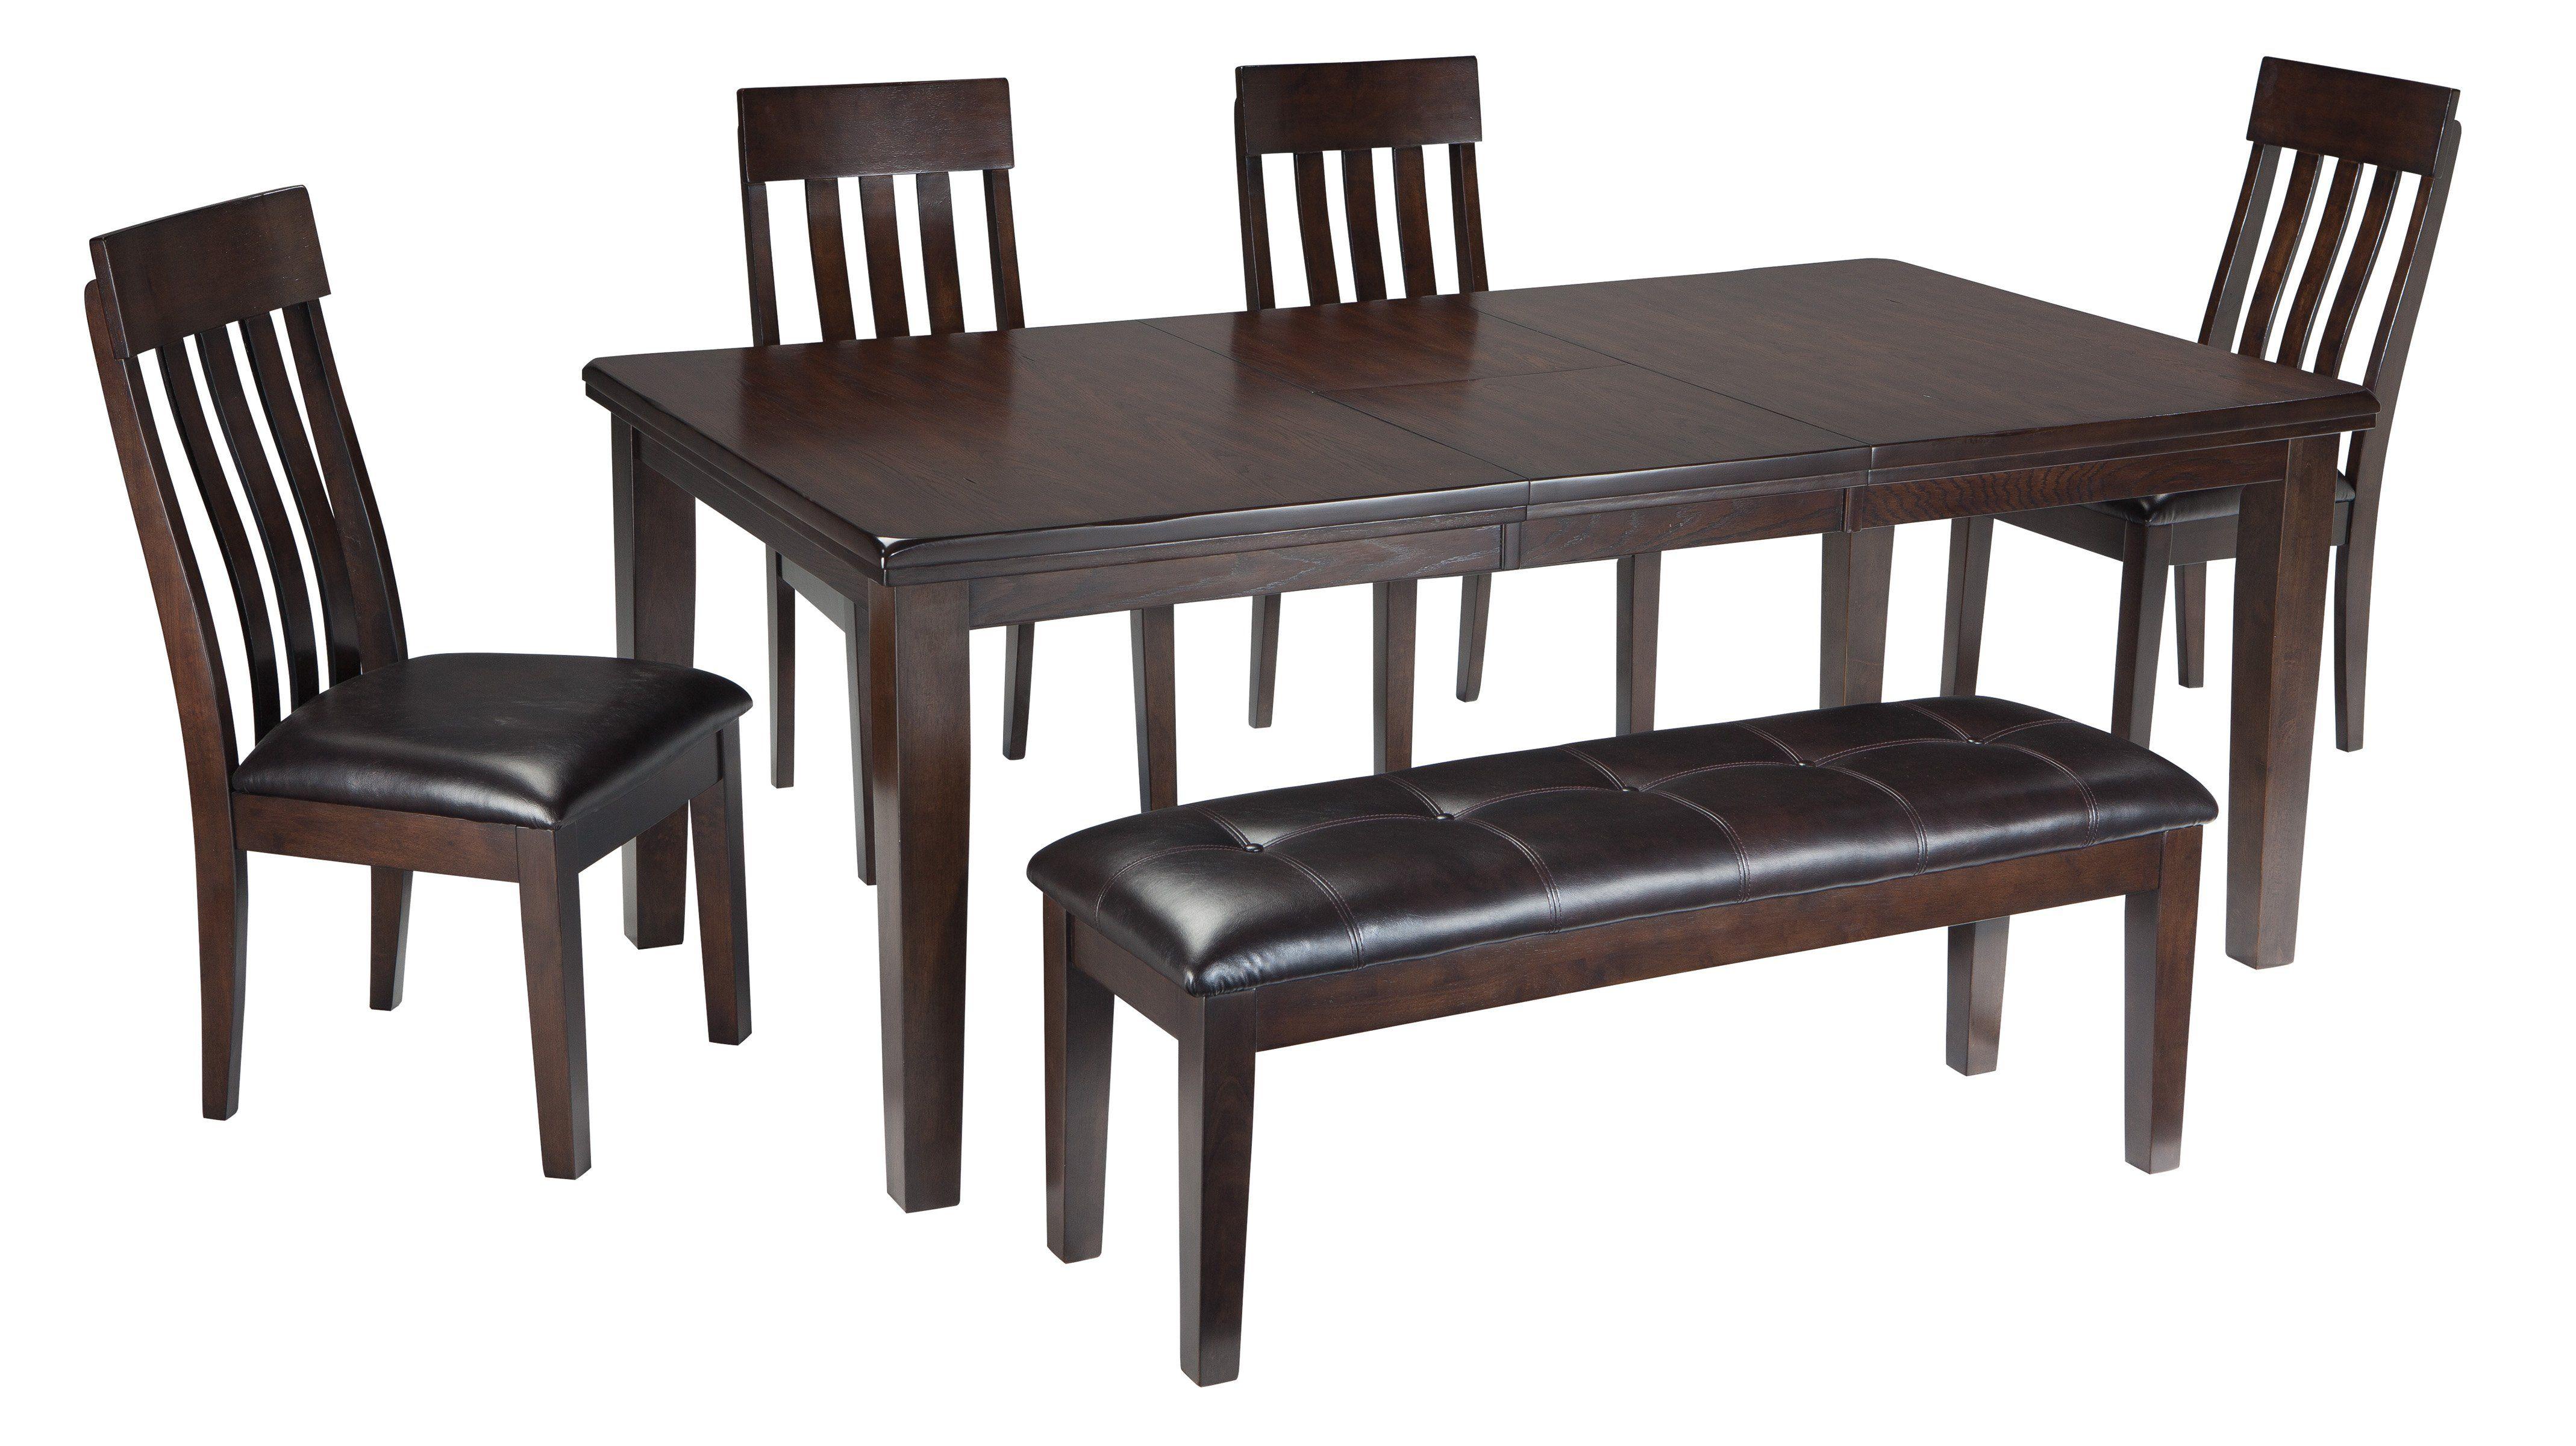 Haddigan 6 Piece Rectangular Dining Room Extendable Dining Table